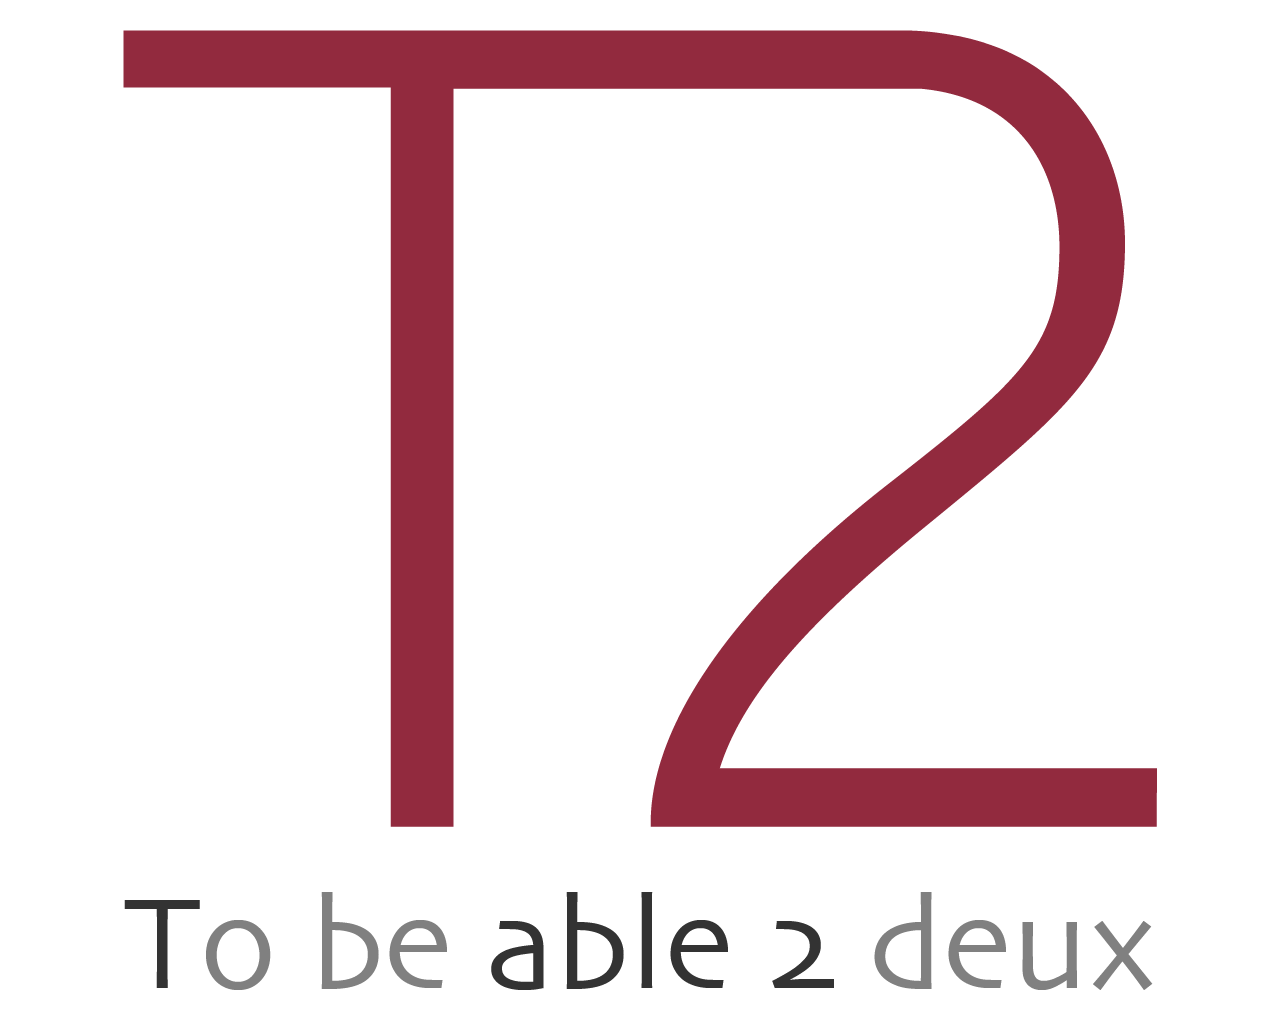 table2_logo_z